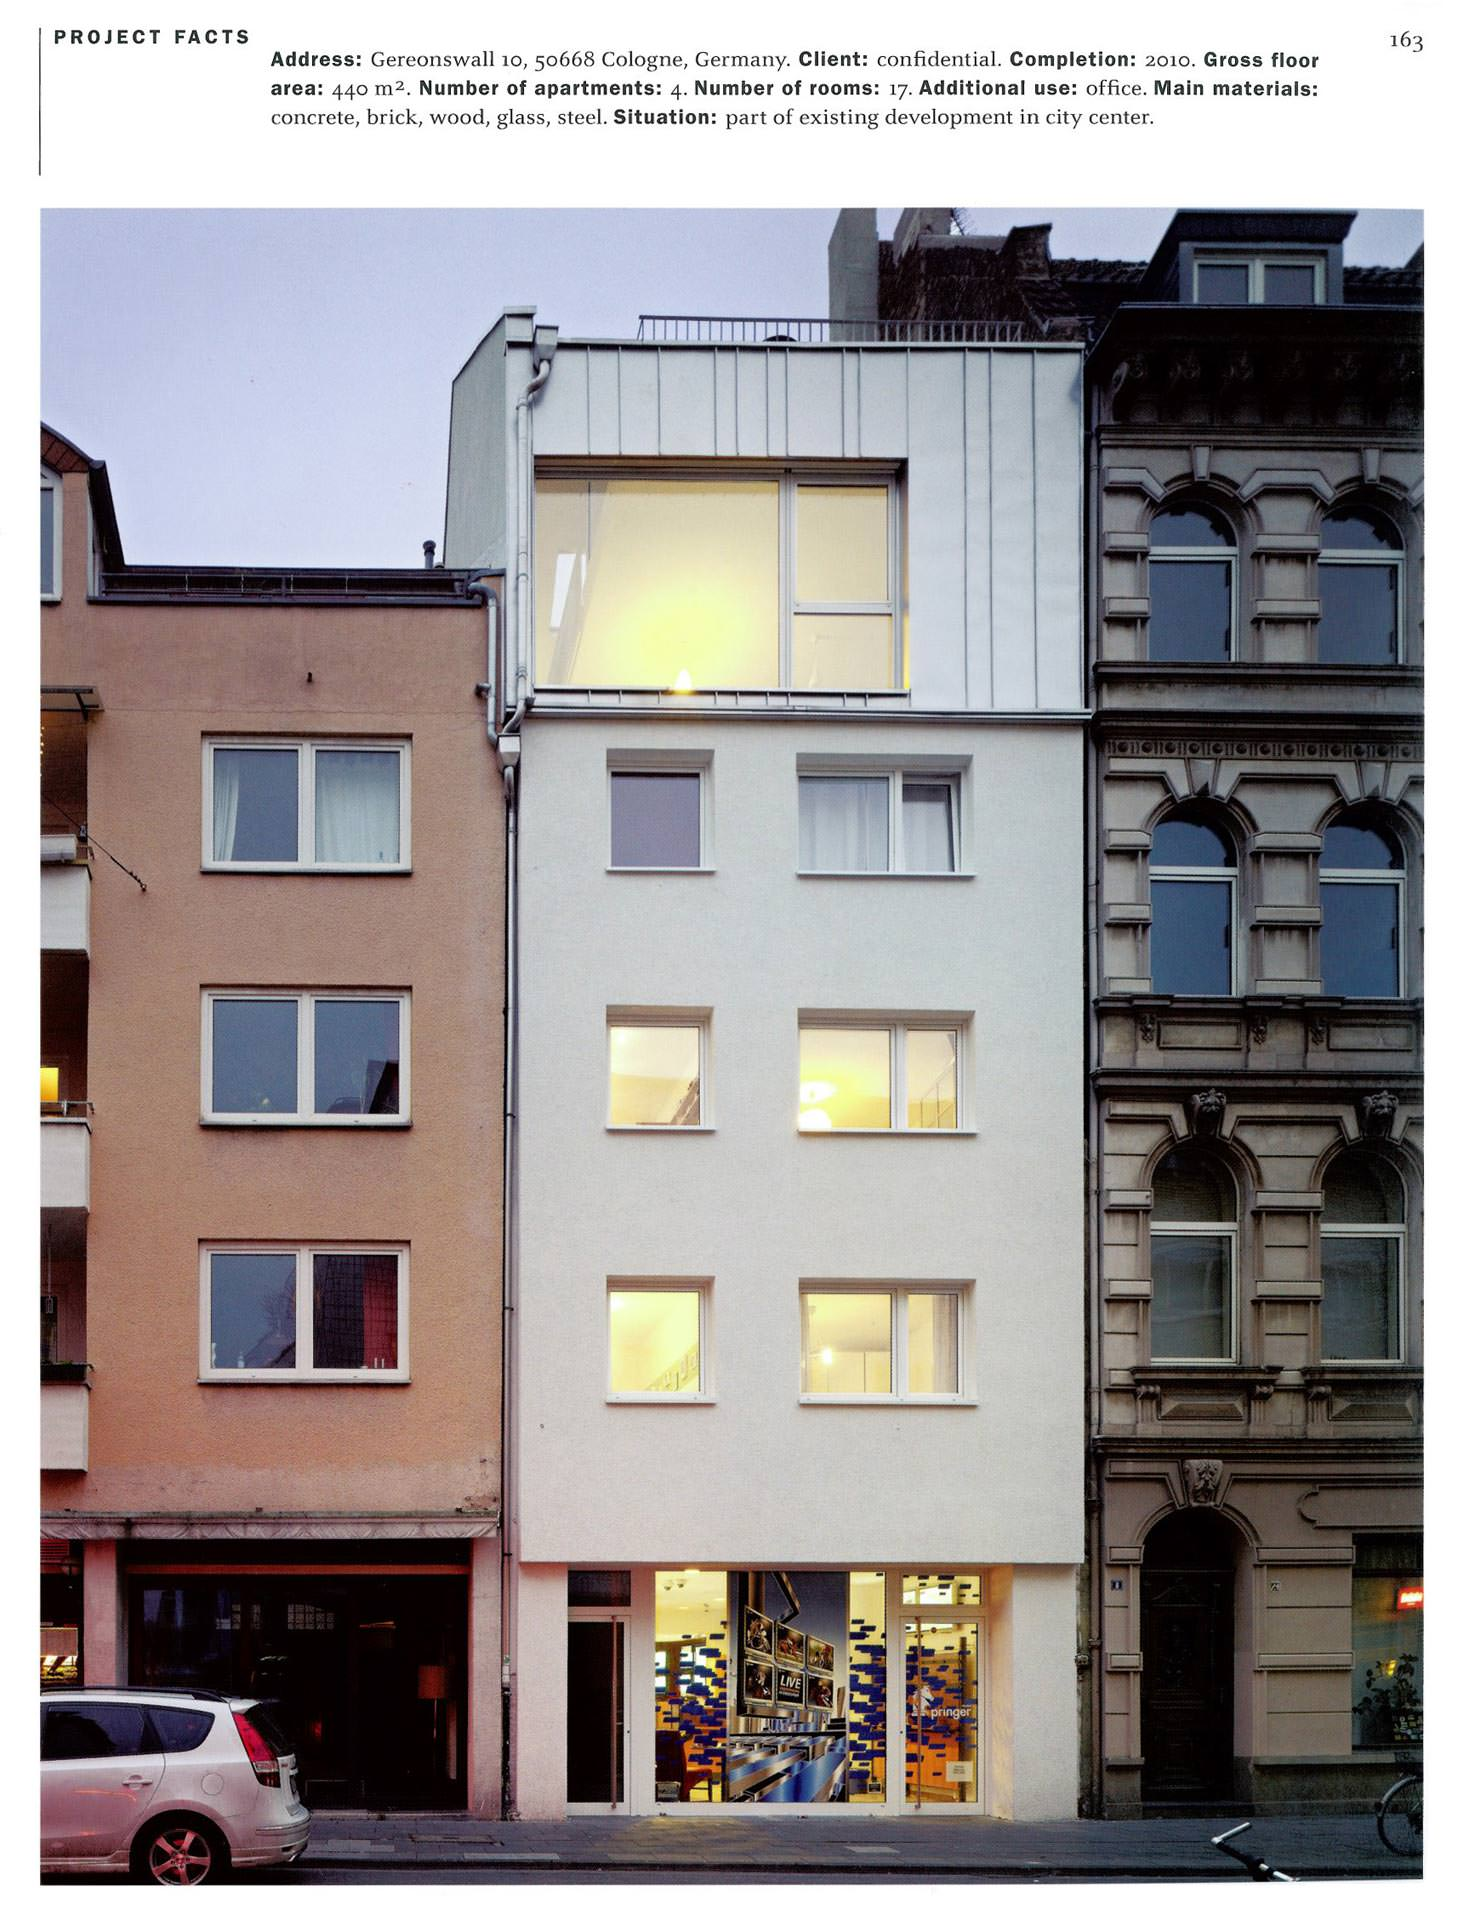 townhouse design haus holtmann cba clemens bachmann architekten m nchen. Black Bedroom Furniture Sets. Home Design Ideas